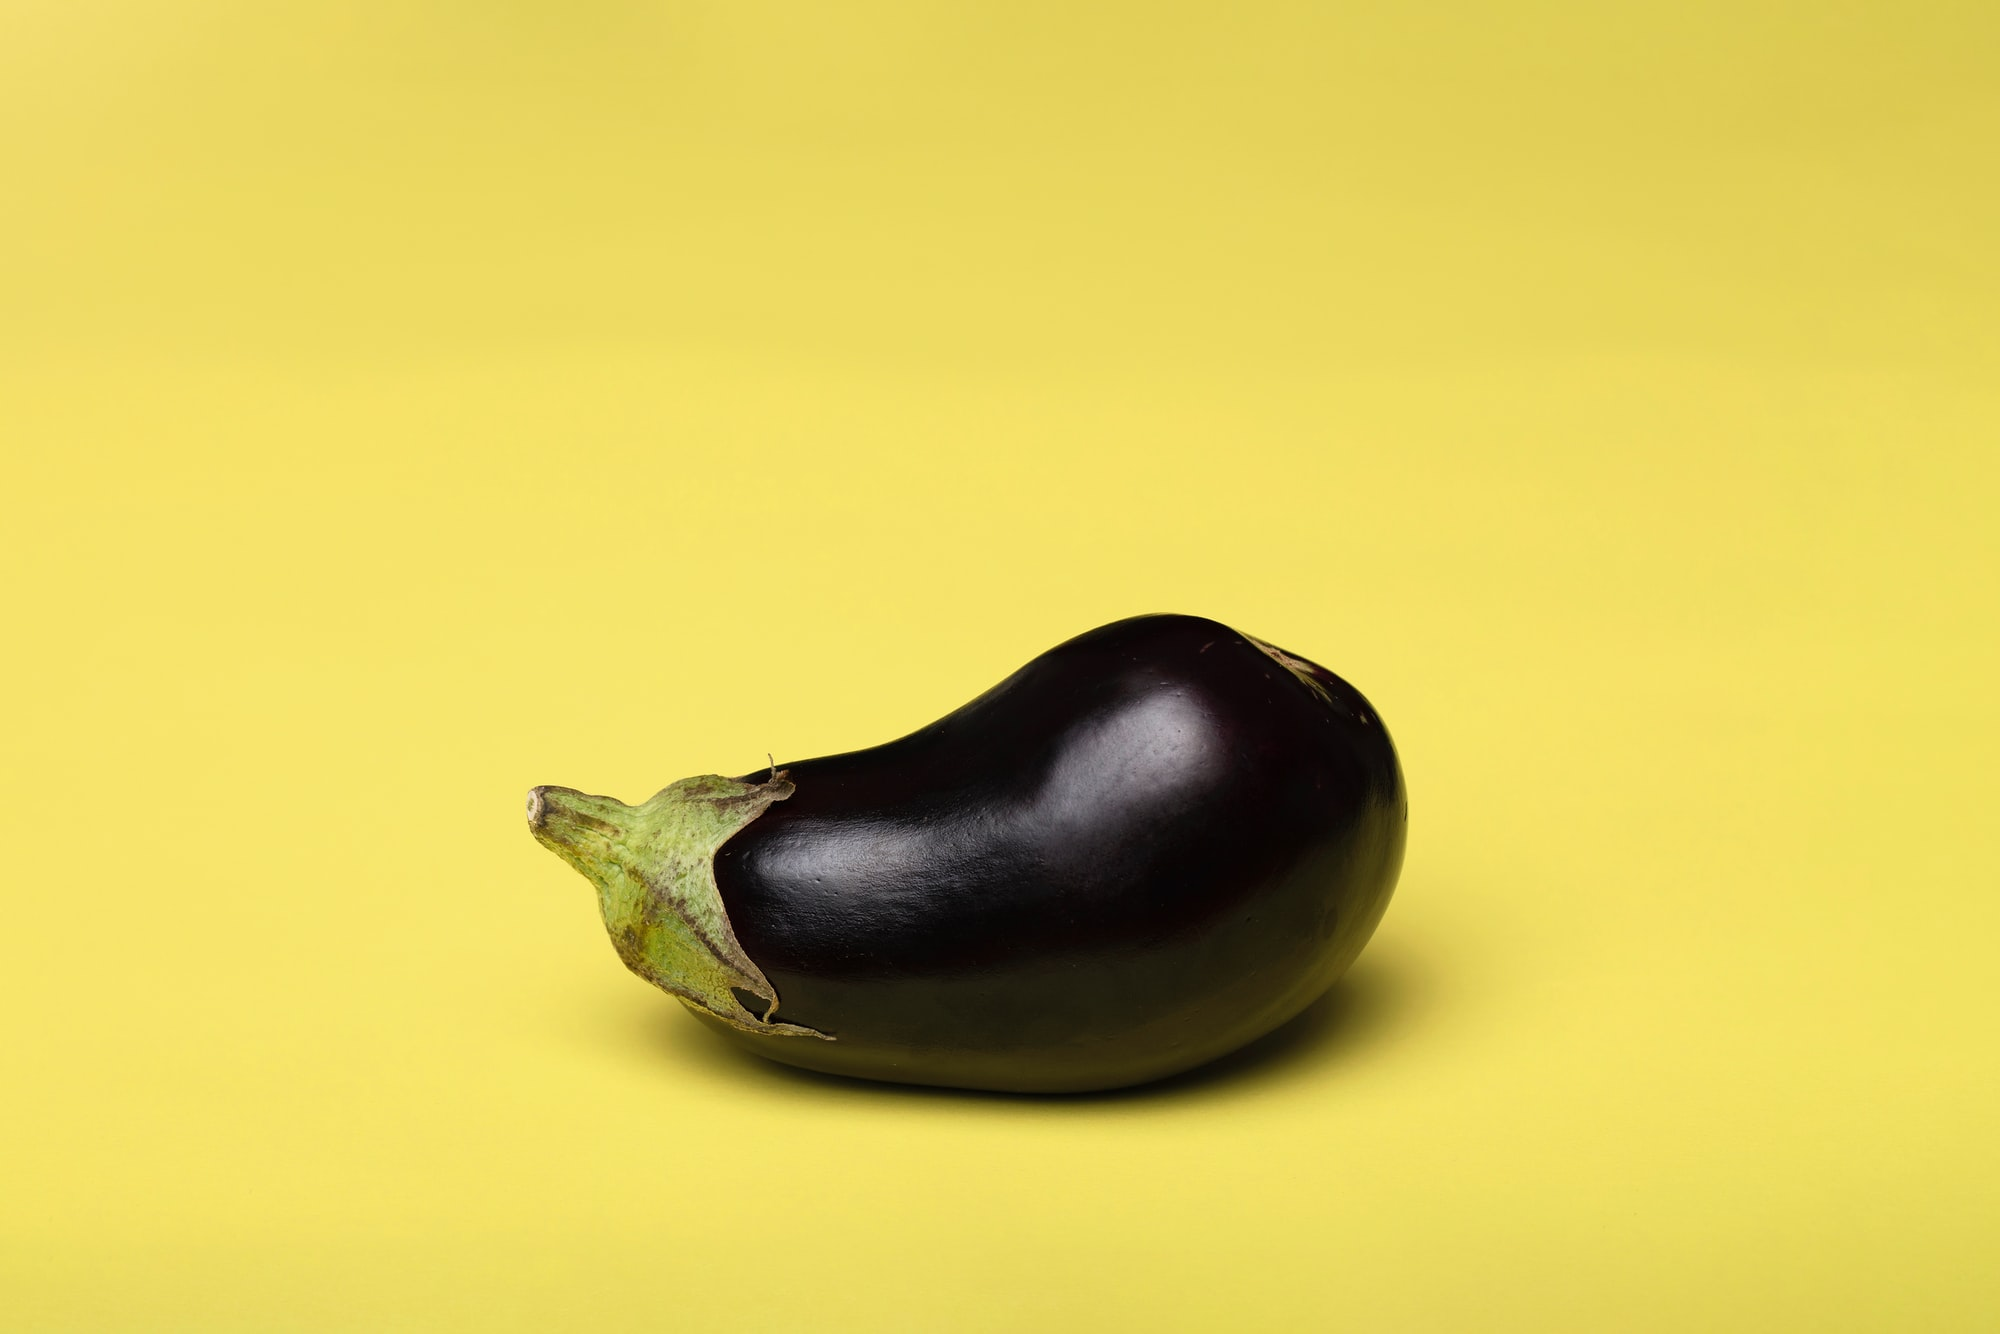 Pickled Aubergine